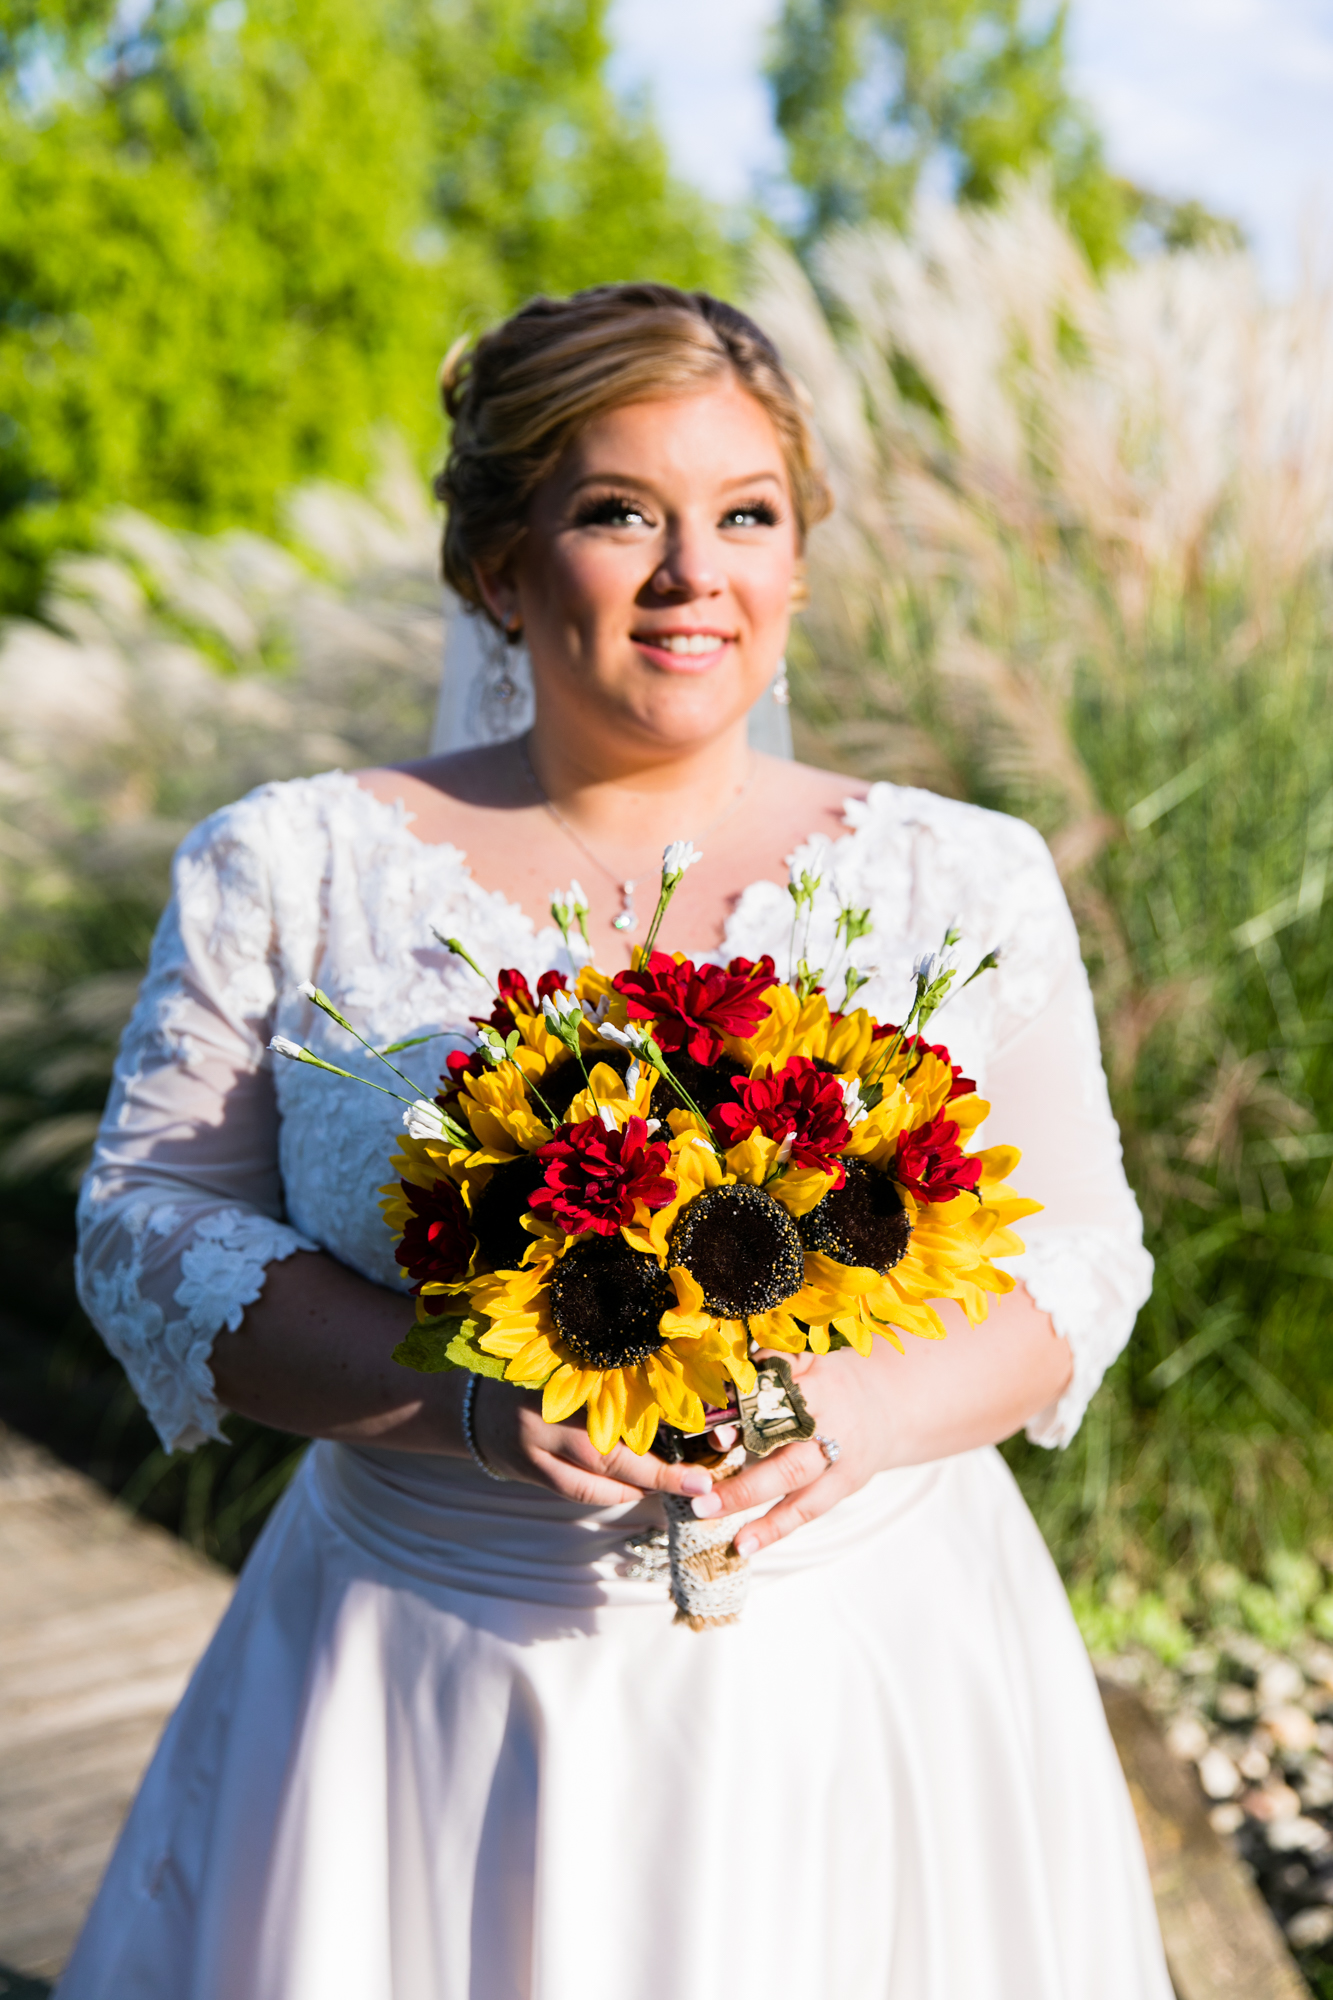 Cedar Brook Country Club Wedding Photography - Lovestruck Pictures-051.jpg